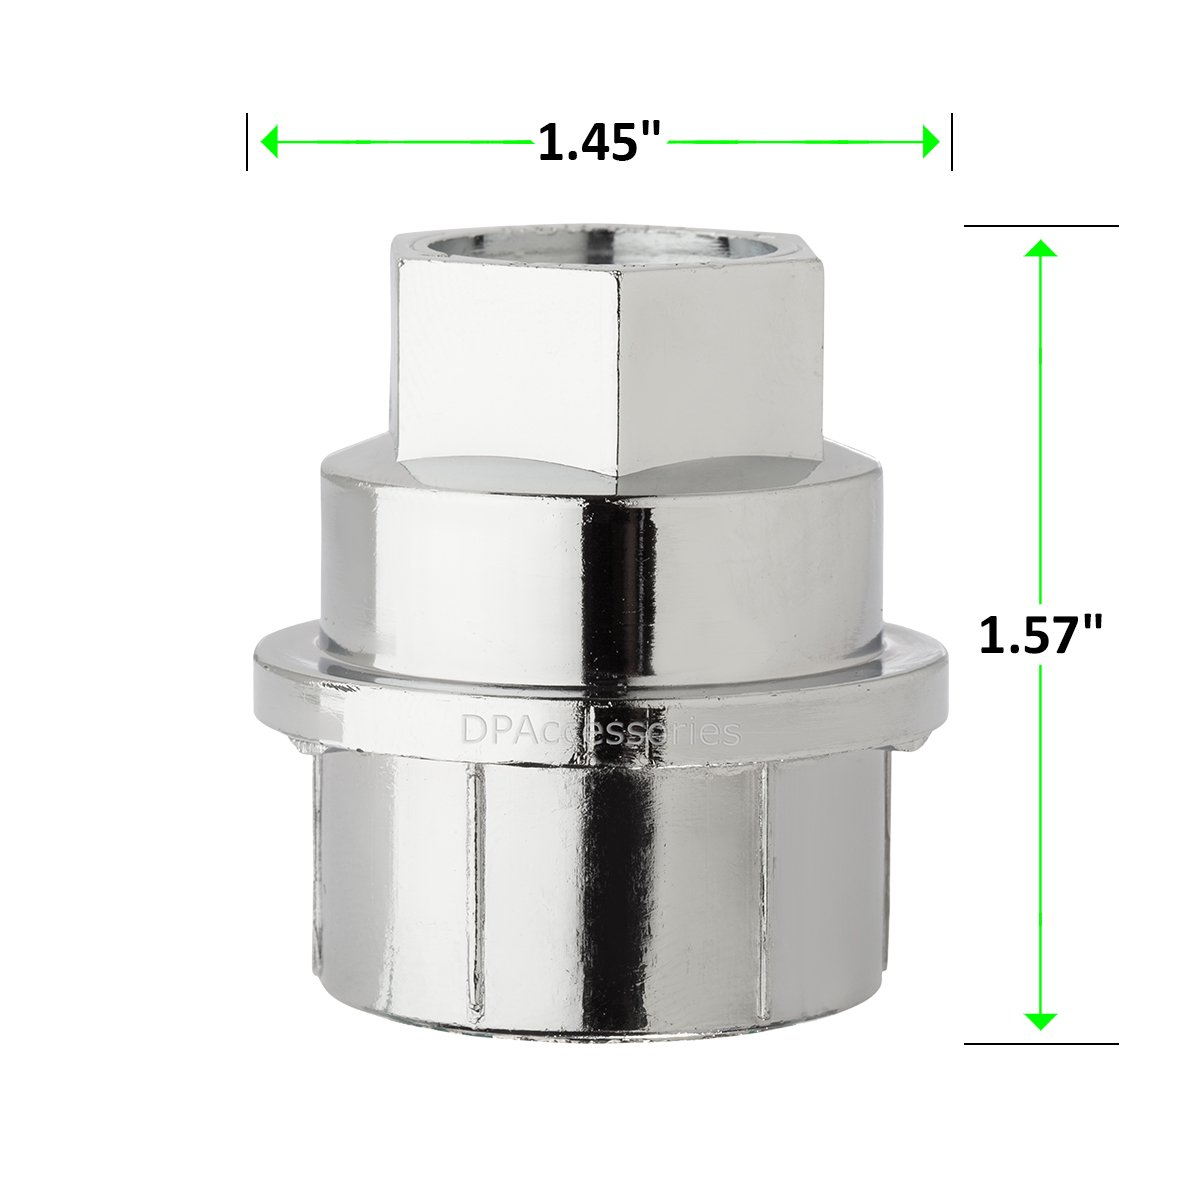 DPAccessories CC-4D-P-OCH05032 32 New Chrome Plastic Wheel Lug Nut Caps - Replaces GM 15646250 / Dorman 99956 Wheel Lug Nut Cap by DPAccessories (Image #4)